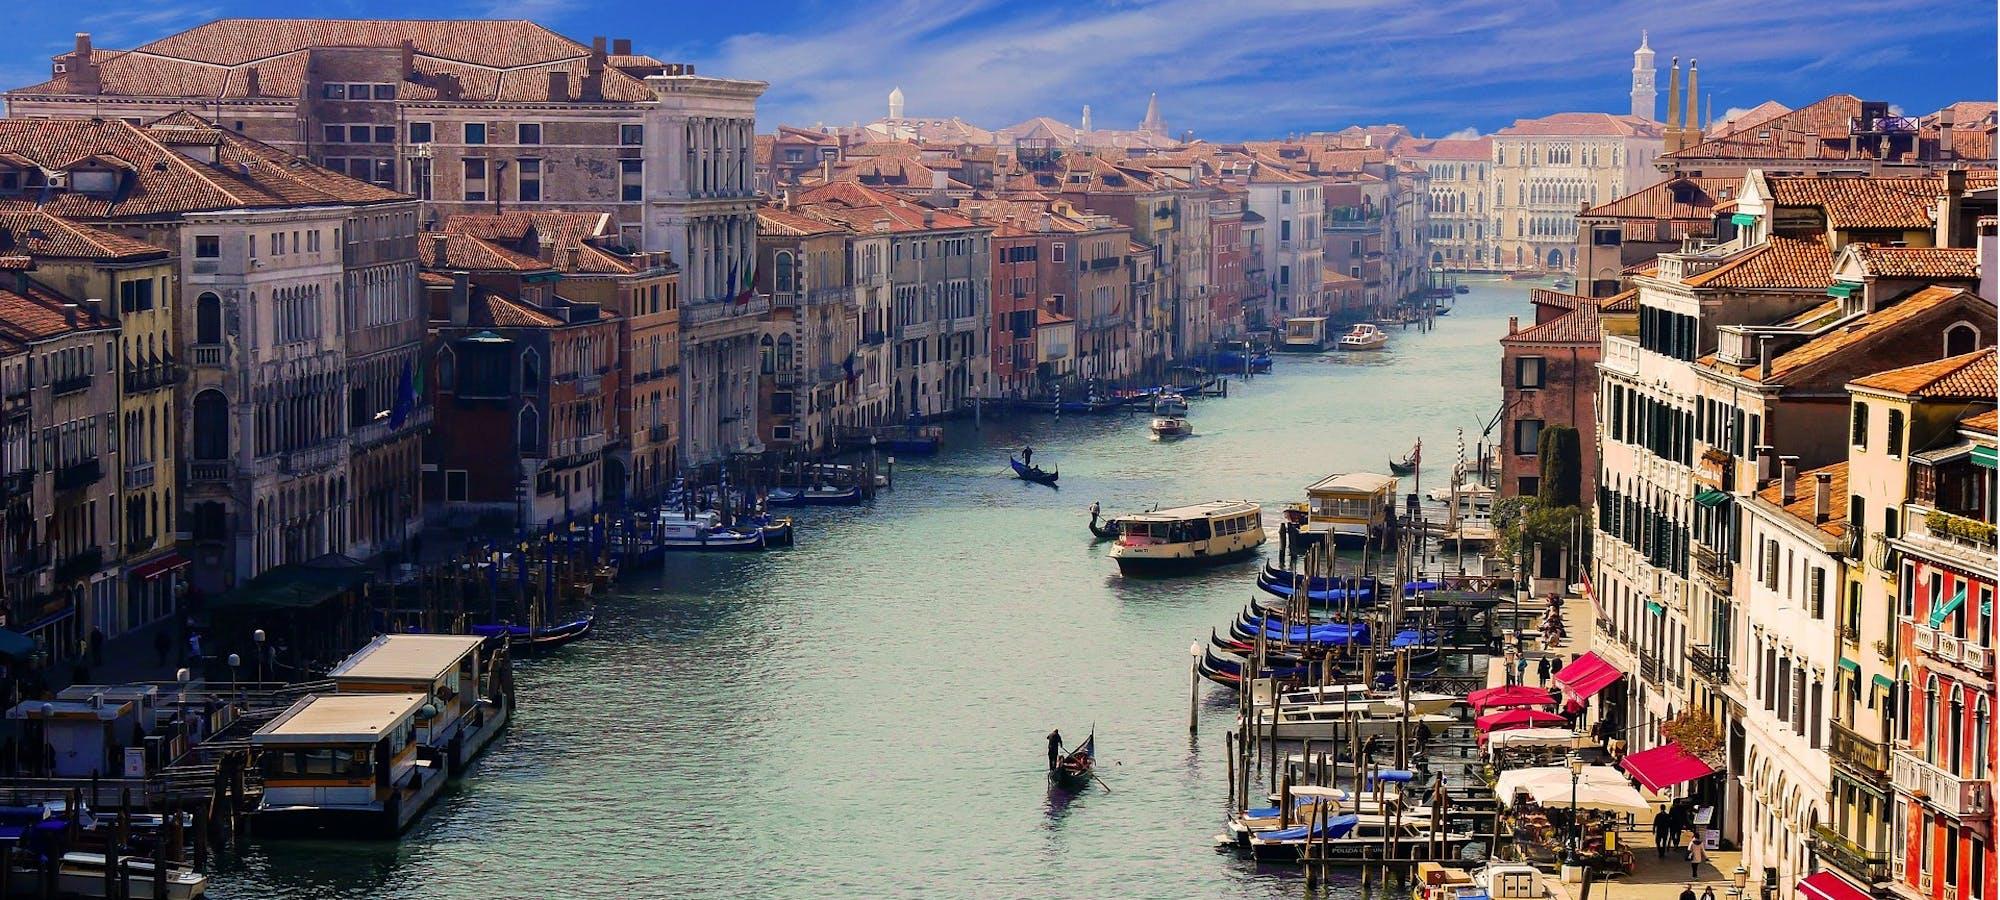 Canal Grande i Venezia © Gerhard Gellinger, Pixabay